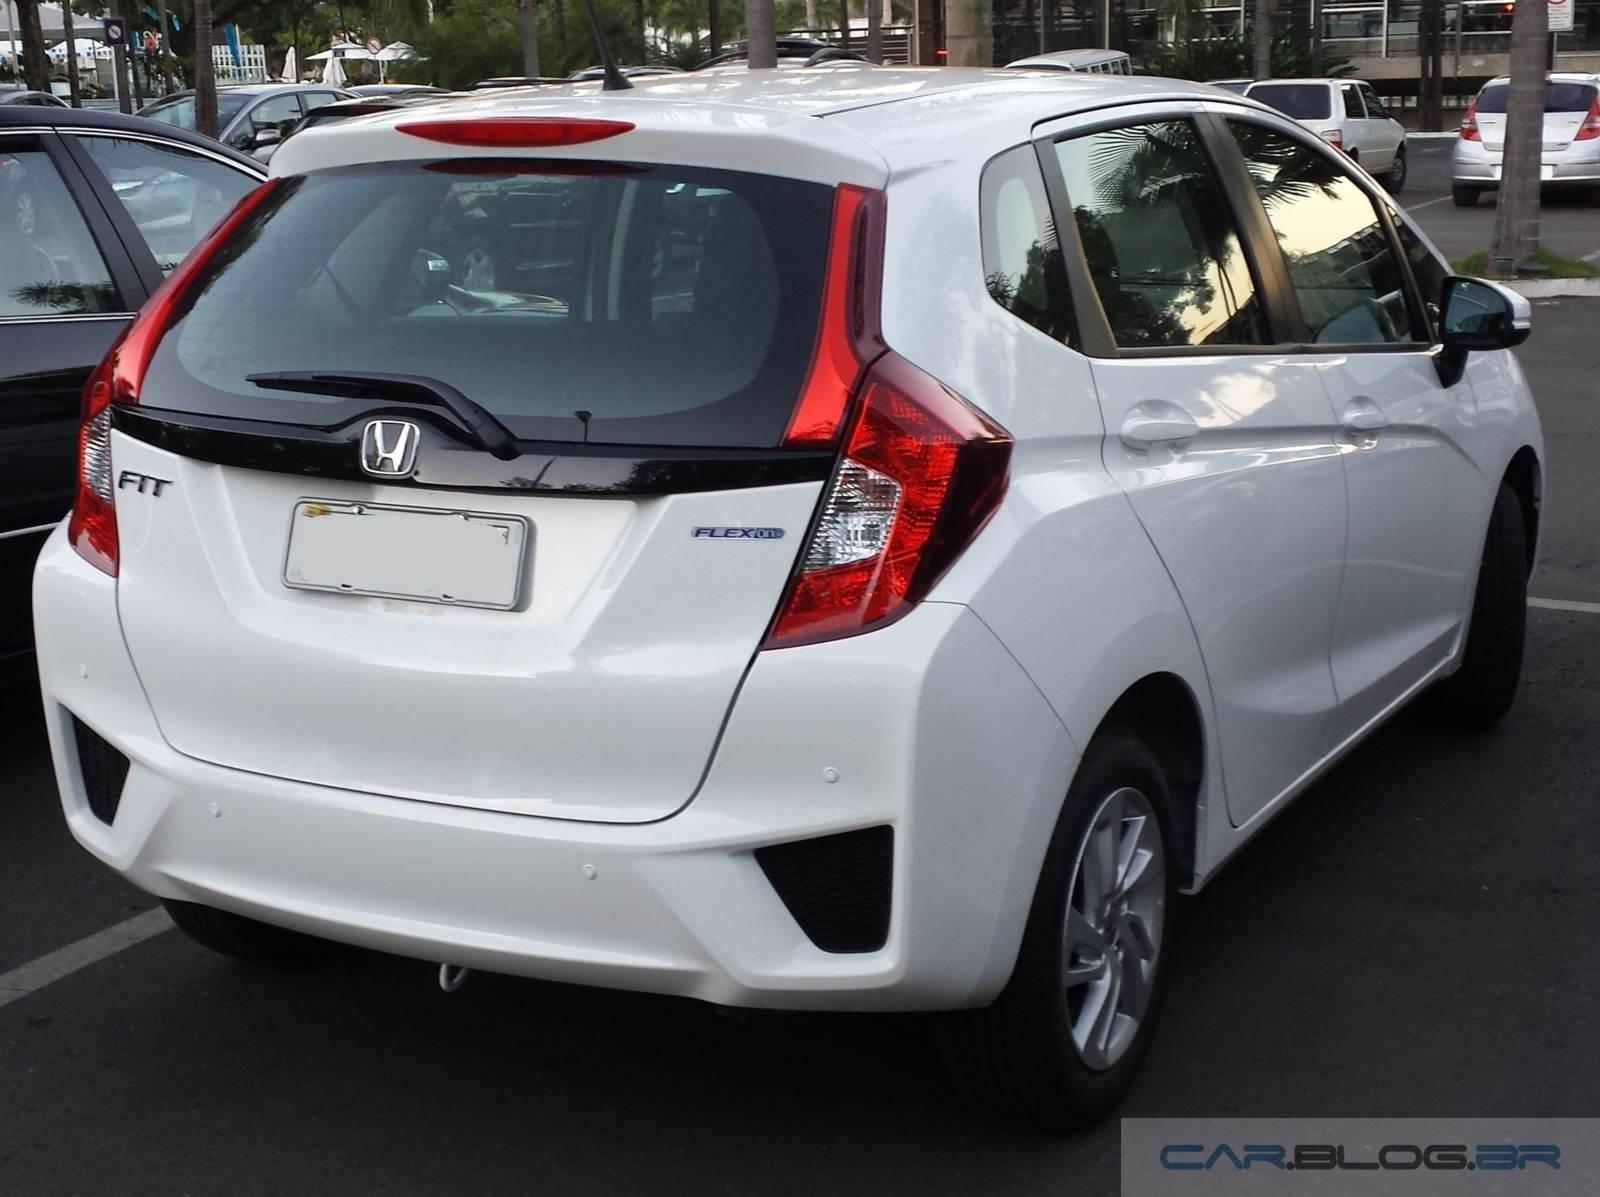 Toyota Corolla para PCD